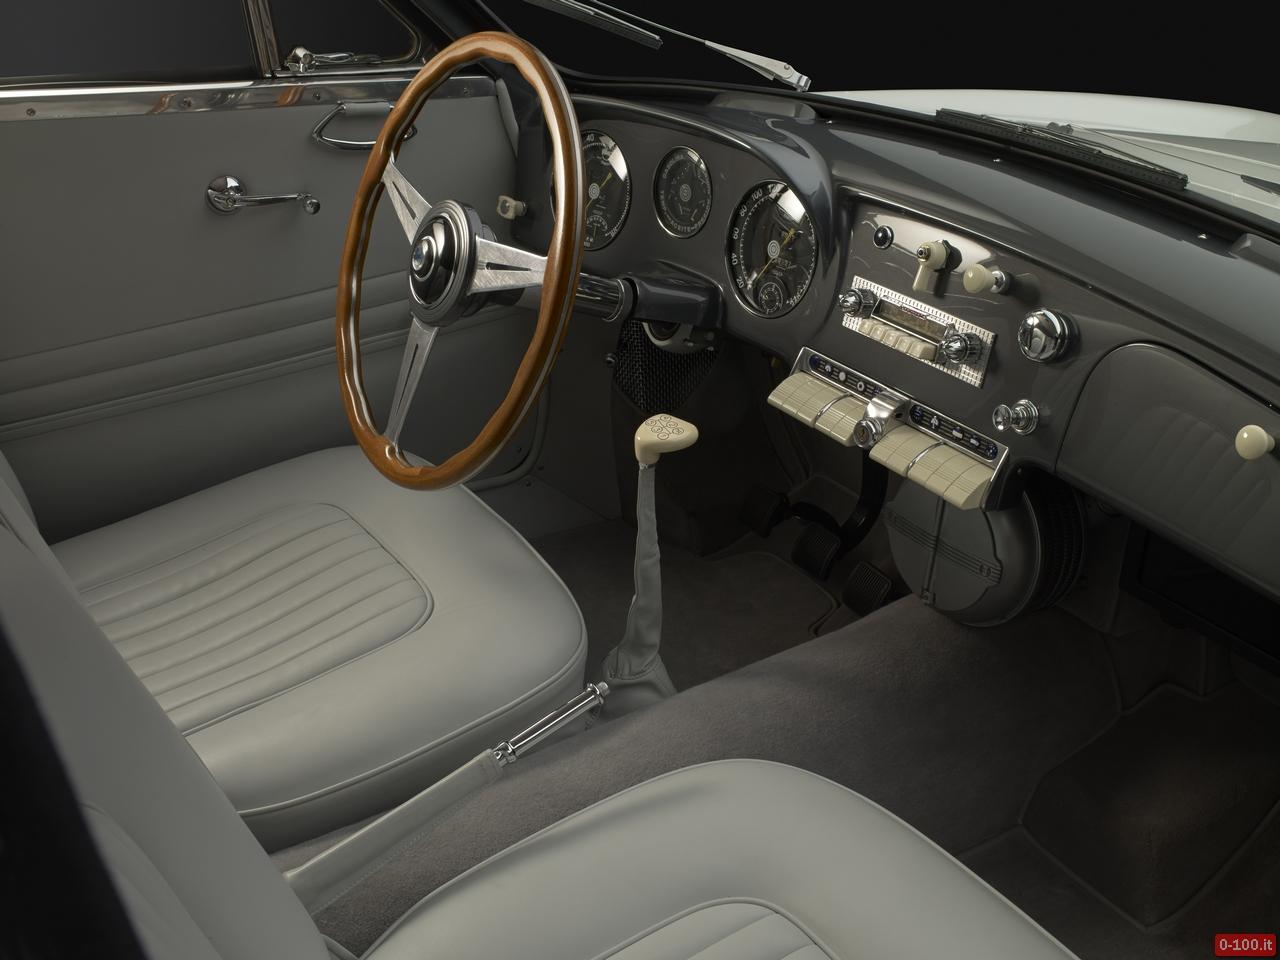 pegaso-z-102-berlinetta-serie-ii-by-carrosserie-j-saoutchik-rm-auctions_0-100_14